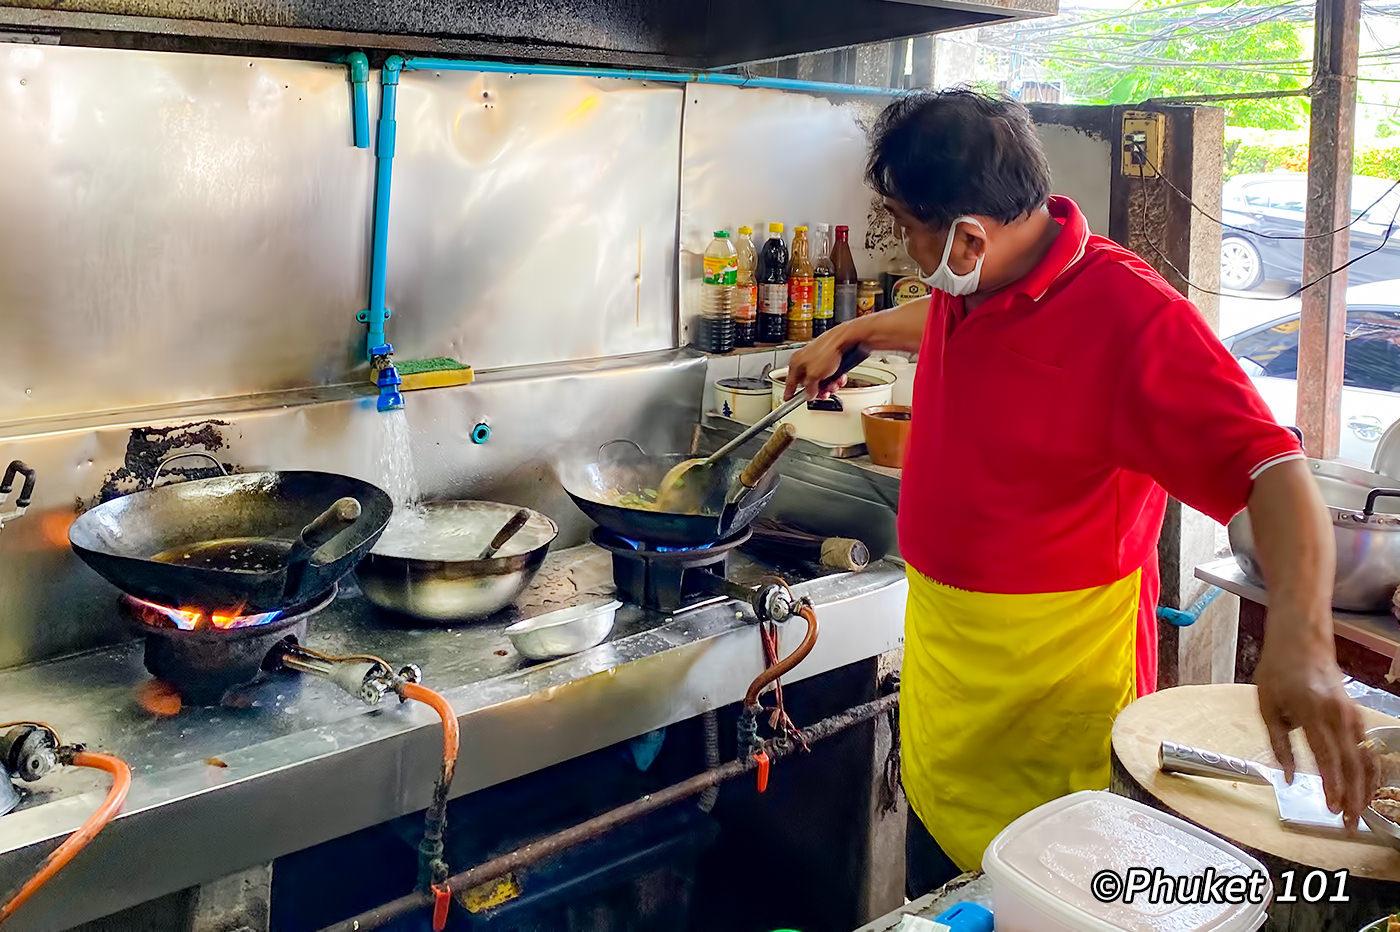 Jadjan Restaurant in Phuket Towm